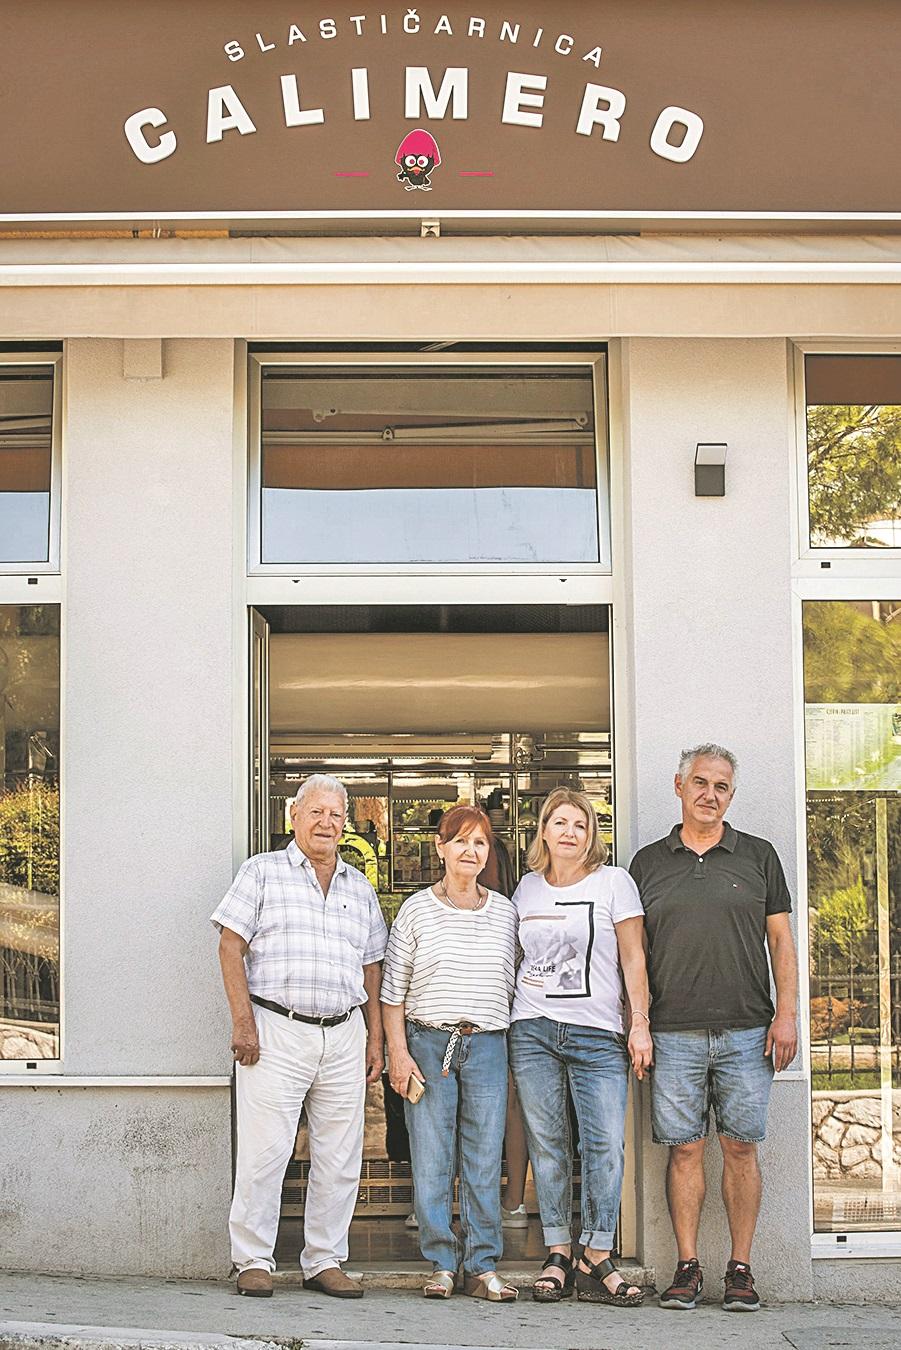 Sibenik, 030918. Obitelj Ademi, vlasnici slasticarne Calimero. Foto: Nikolina Vukovic Stipanicev / CROPIX